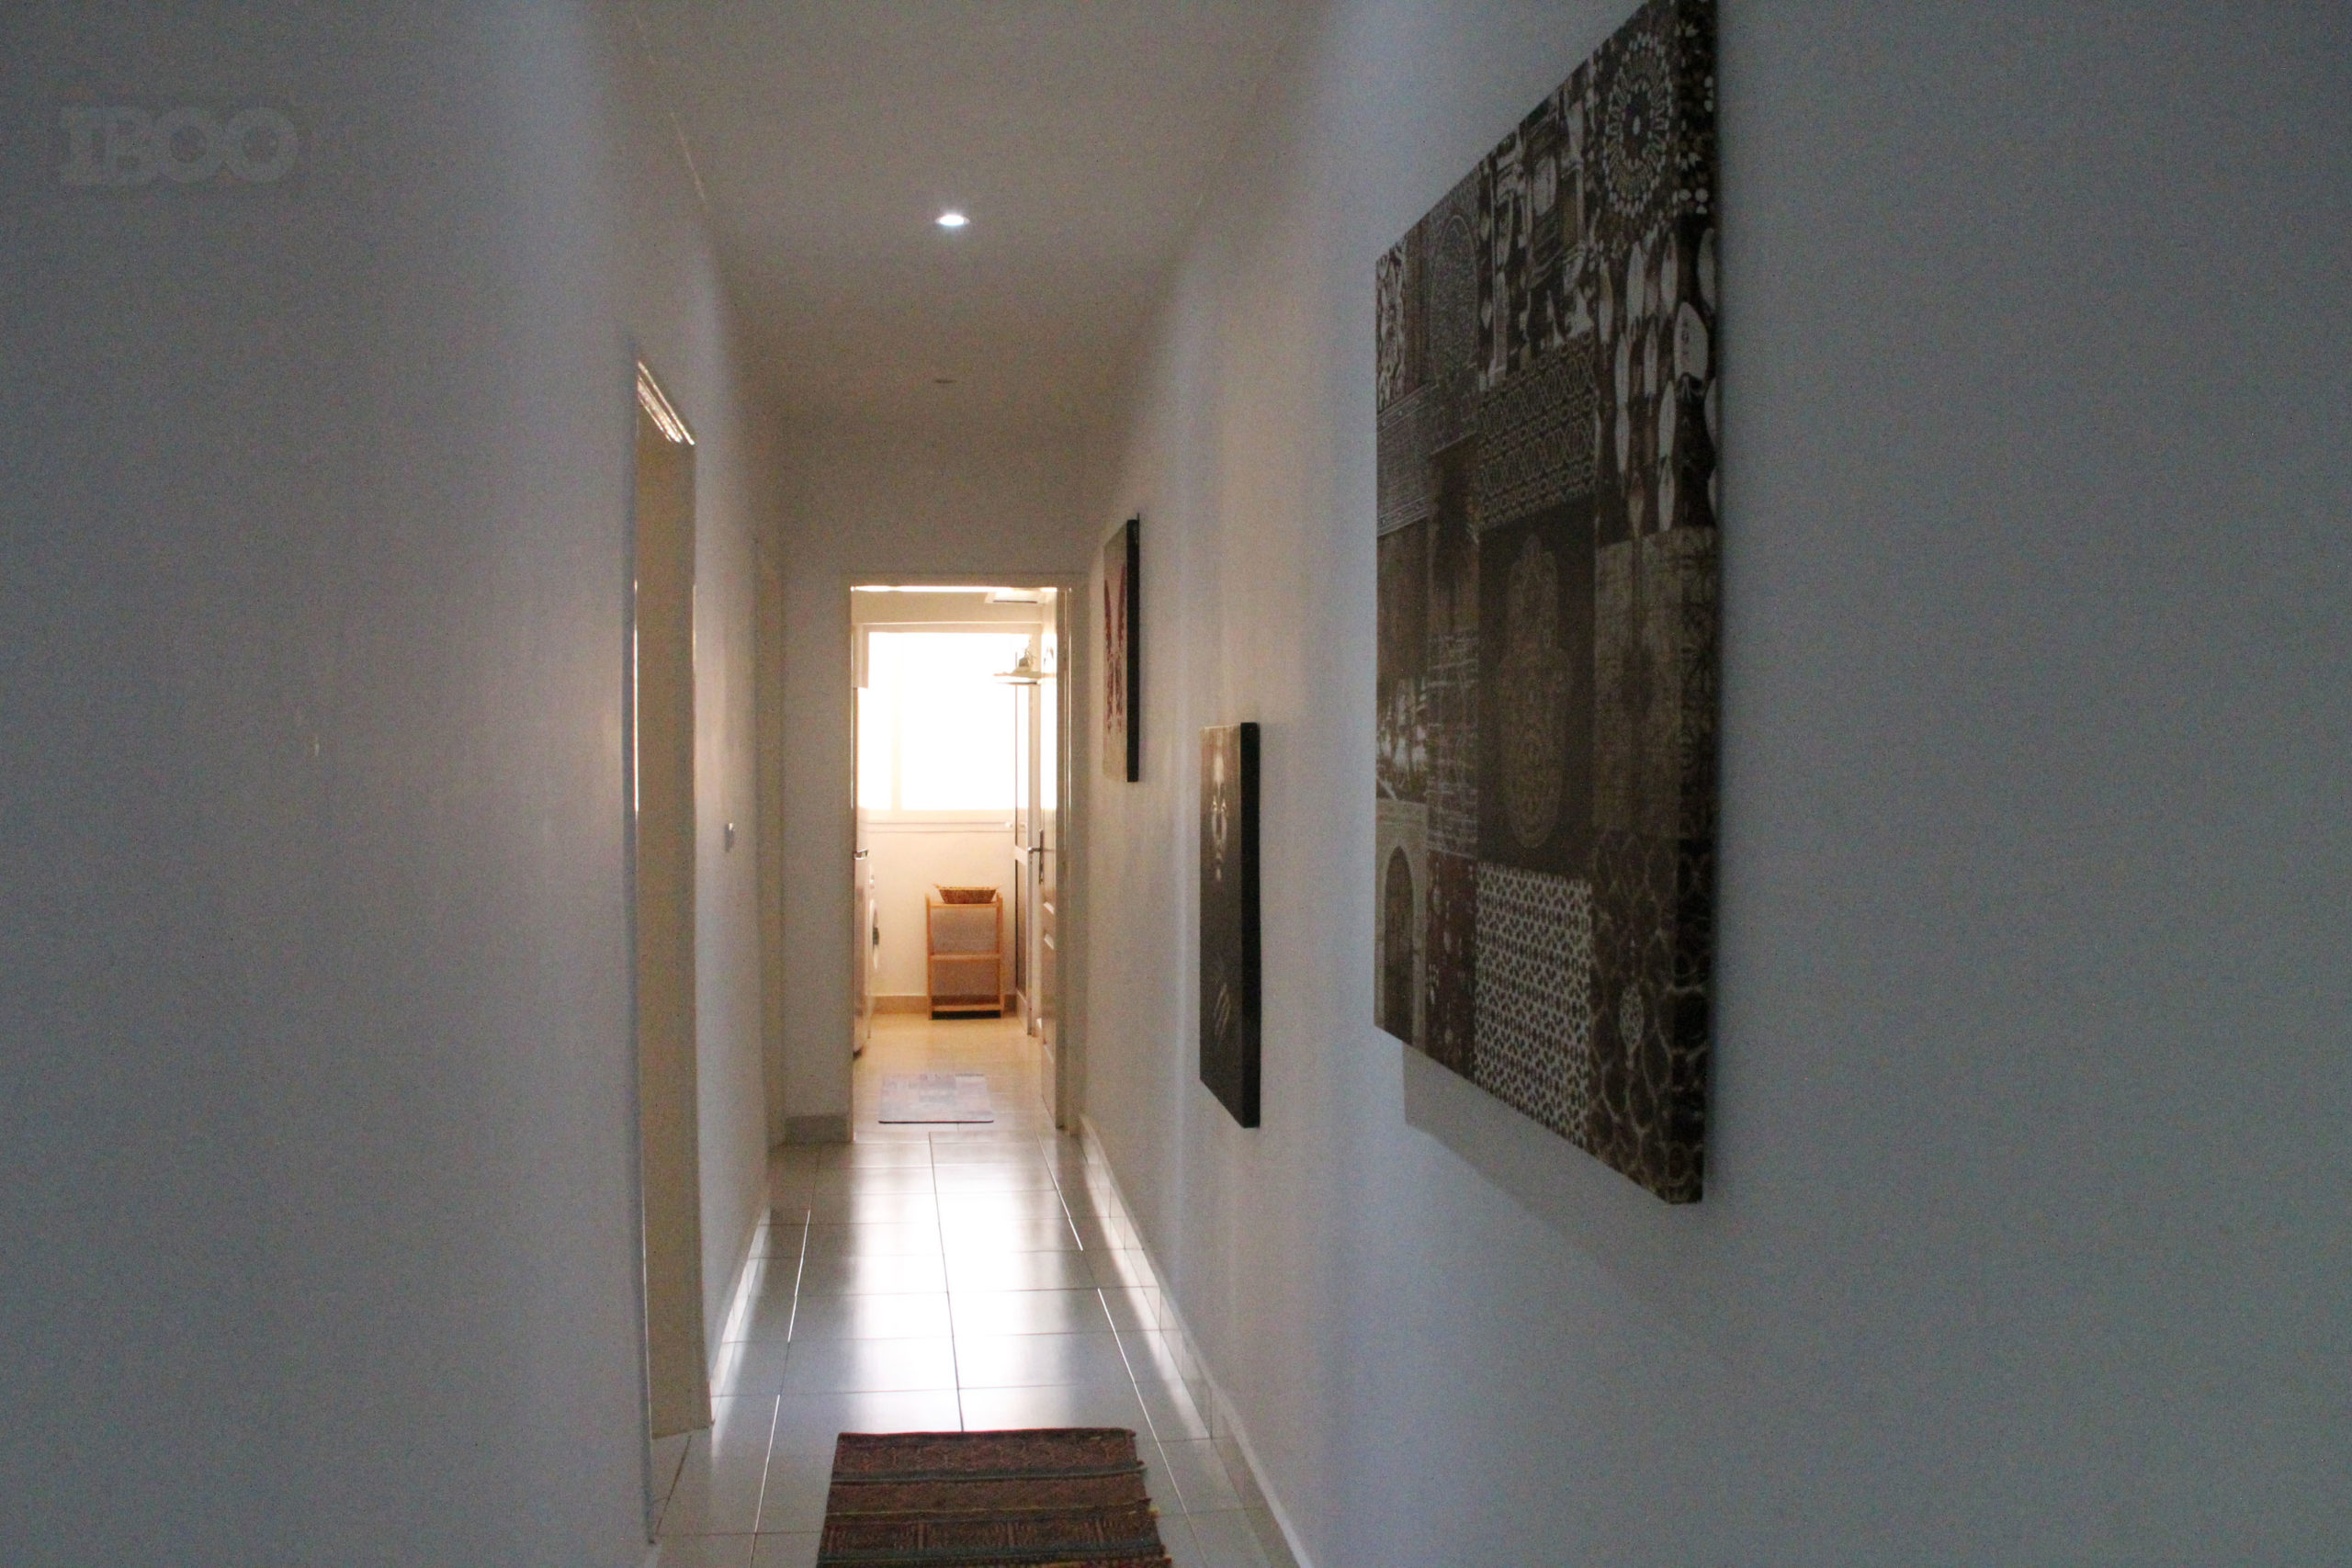 appartement, maison de vacance , Dakar, Ngor, Almadies, restaurant, bar, cafe, senegal